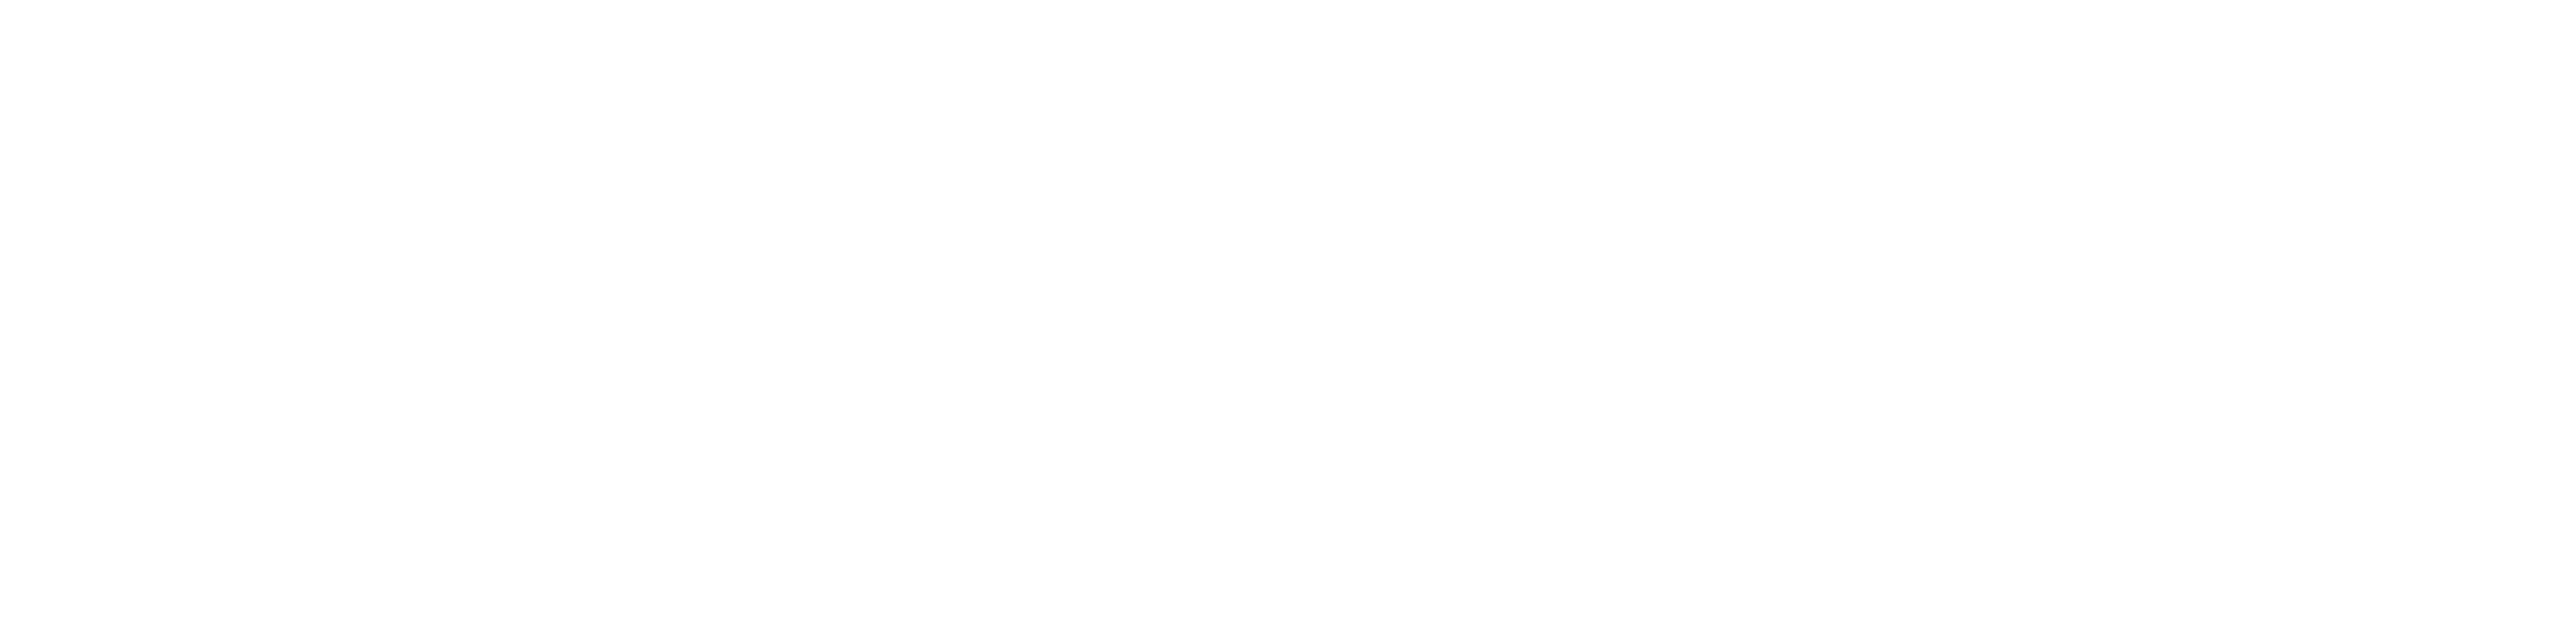 logo-wAsset 1@3x